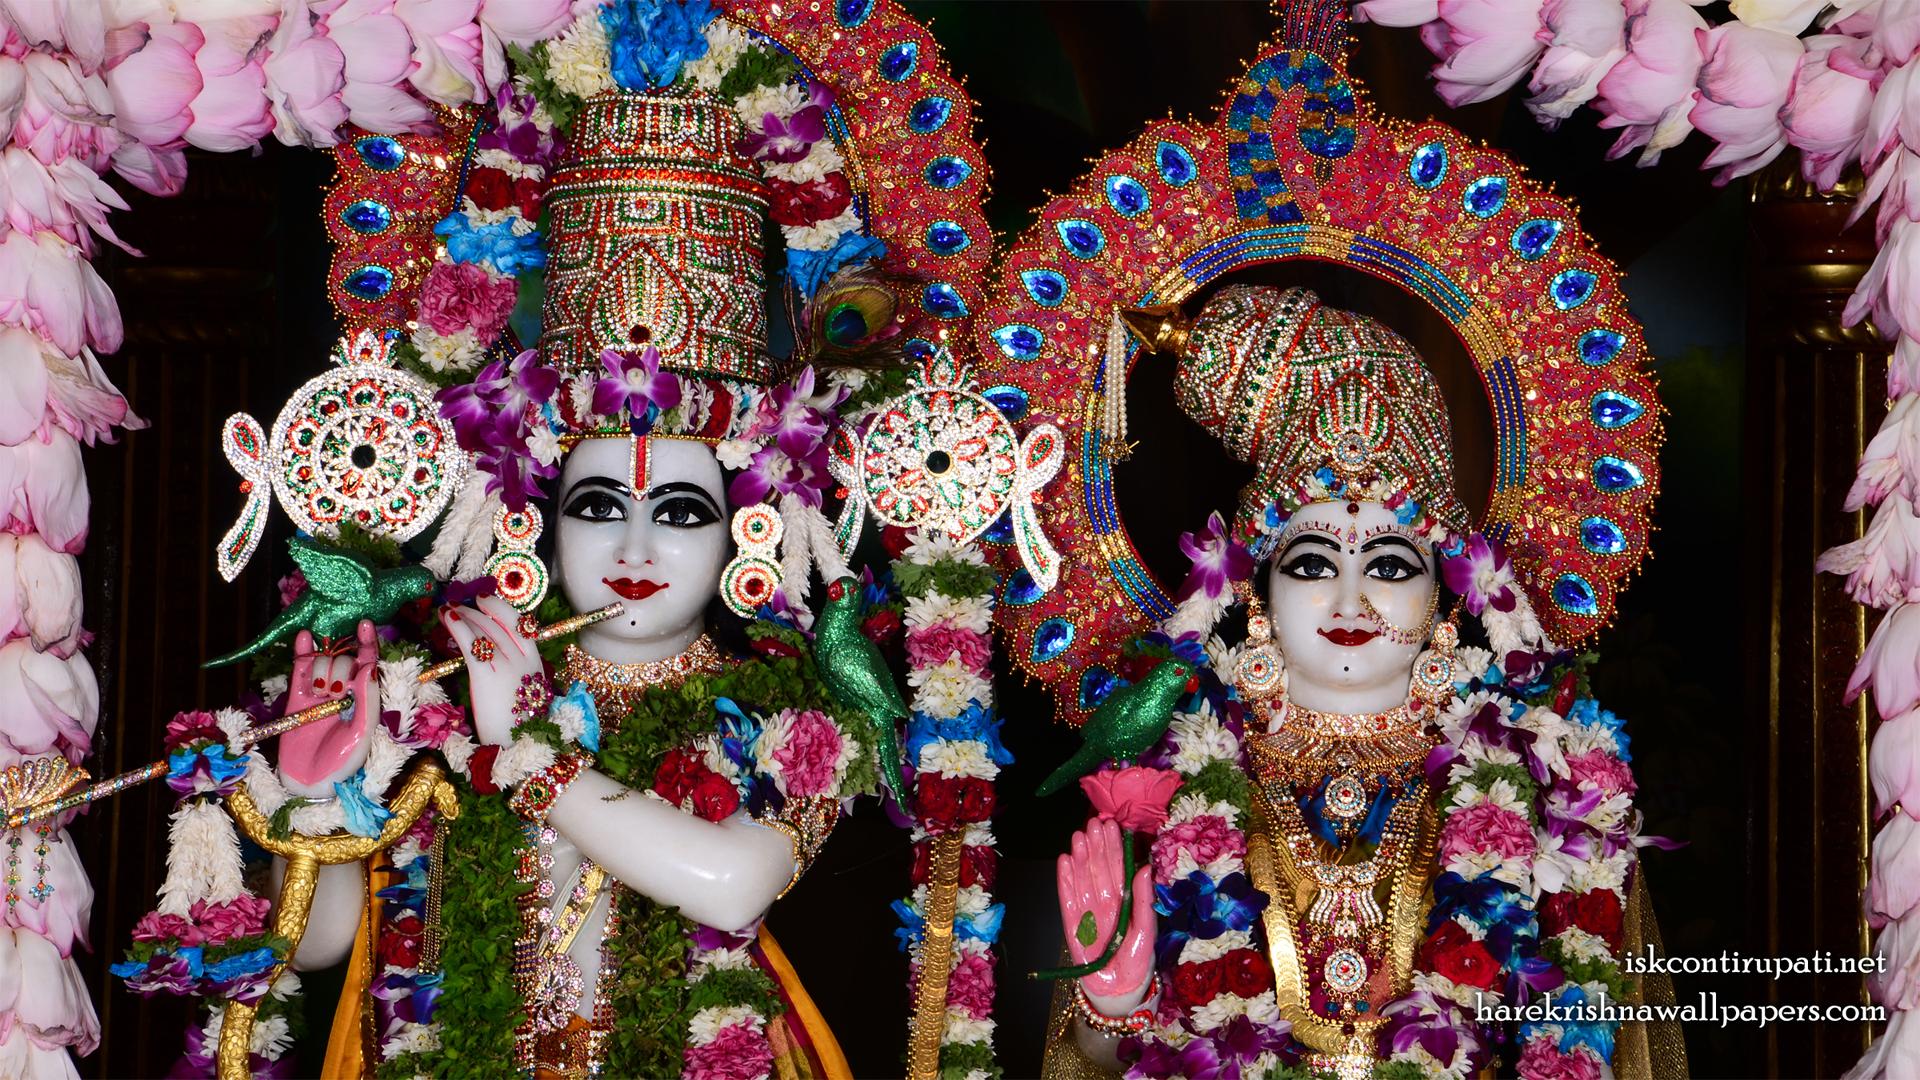 Sri Sri Radha Govinda Close up Wallpaper (005) Size 1920x1080 Download